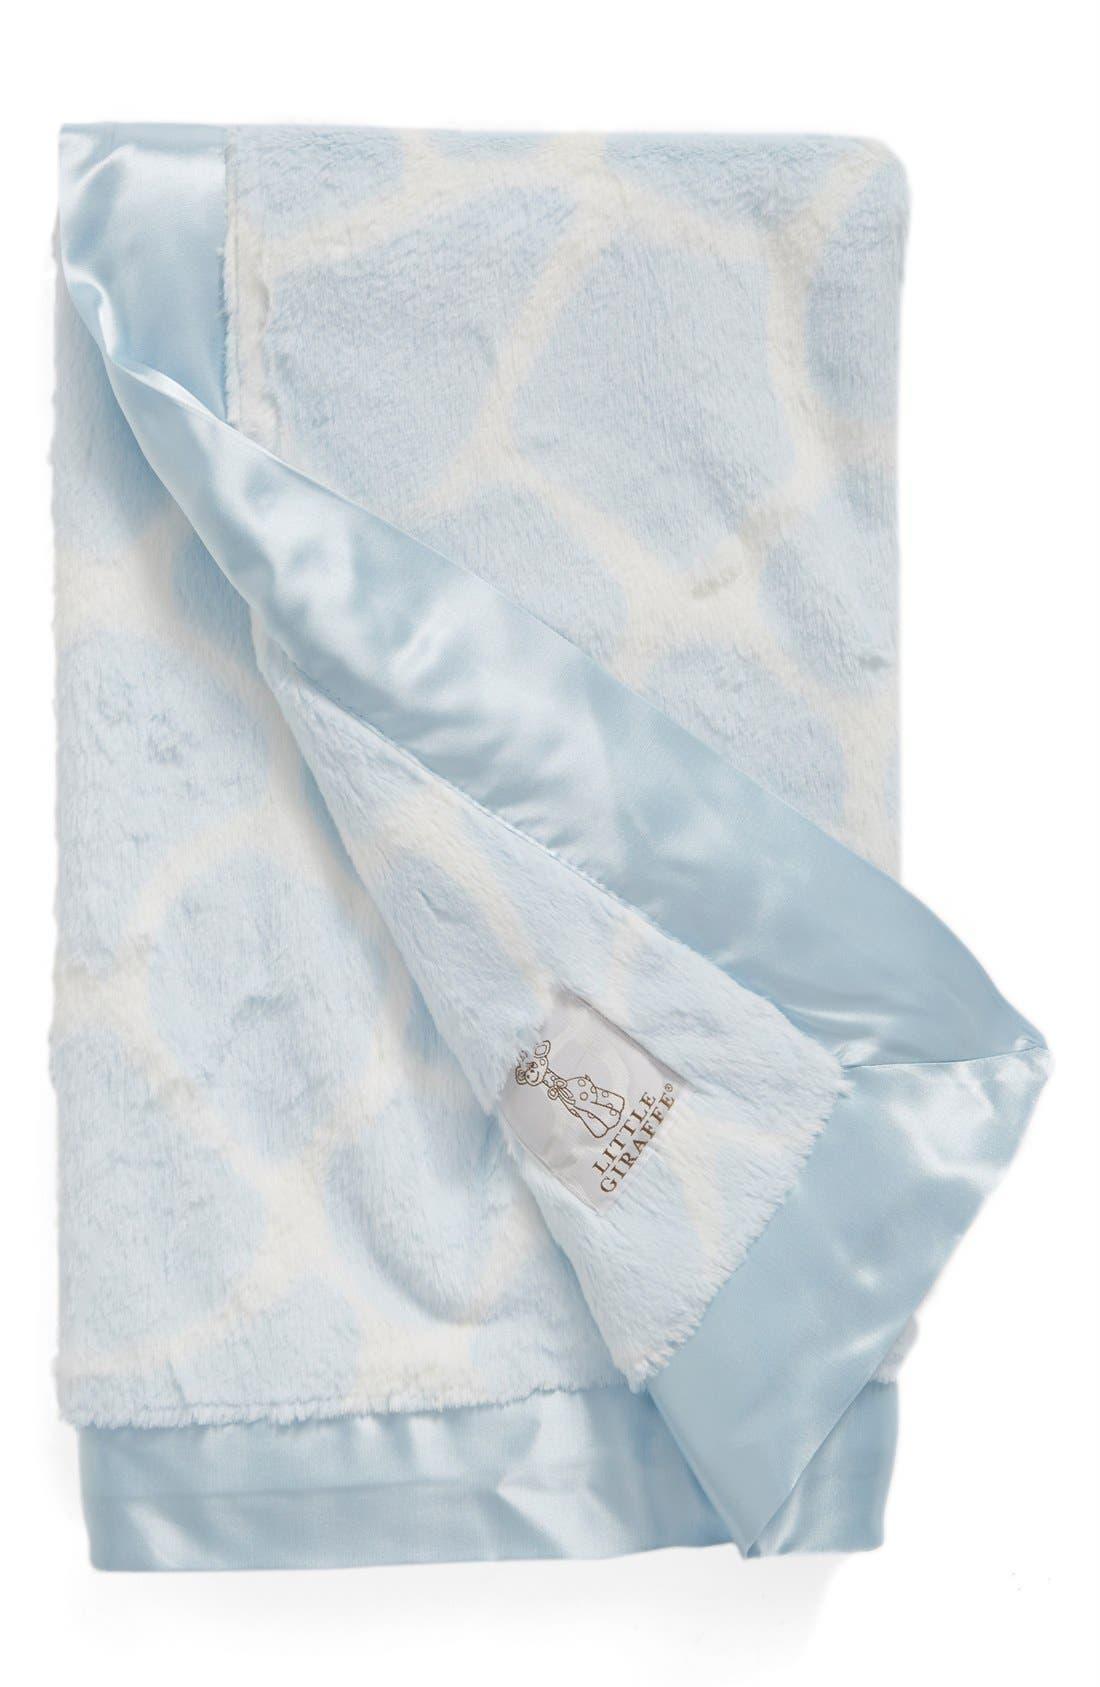 Little Giraffe 'Luxe Giraffe Print™' Blanket